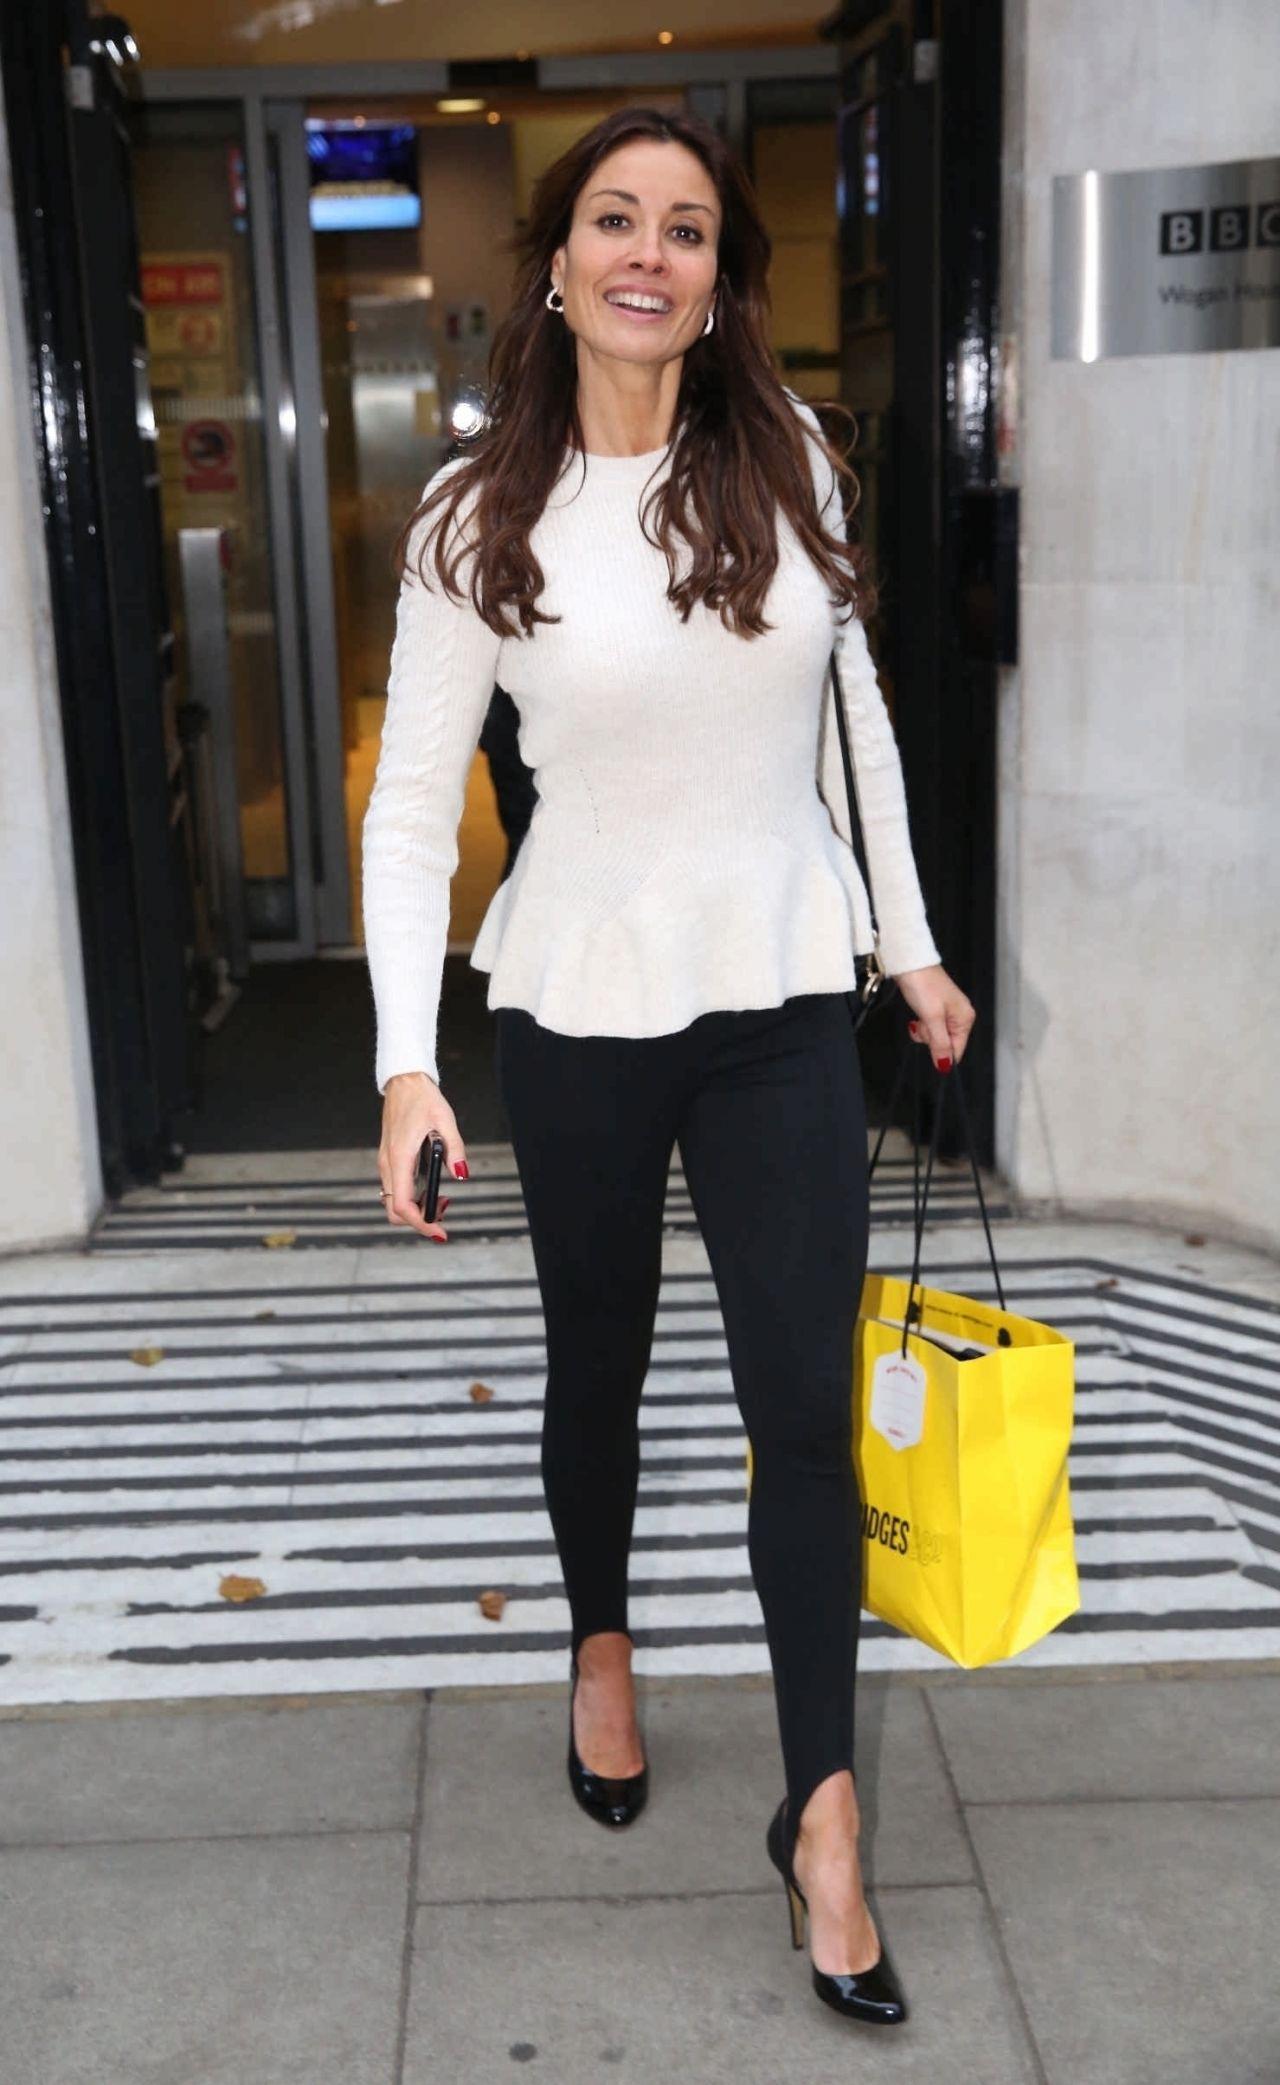 Melanie Sykes Exits Xmas Show Radio 2 in London